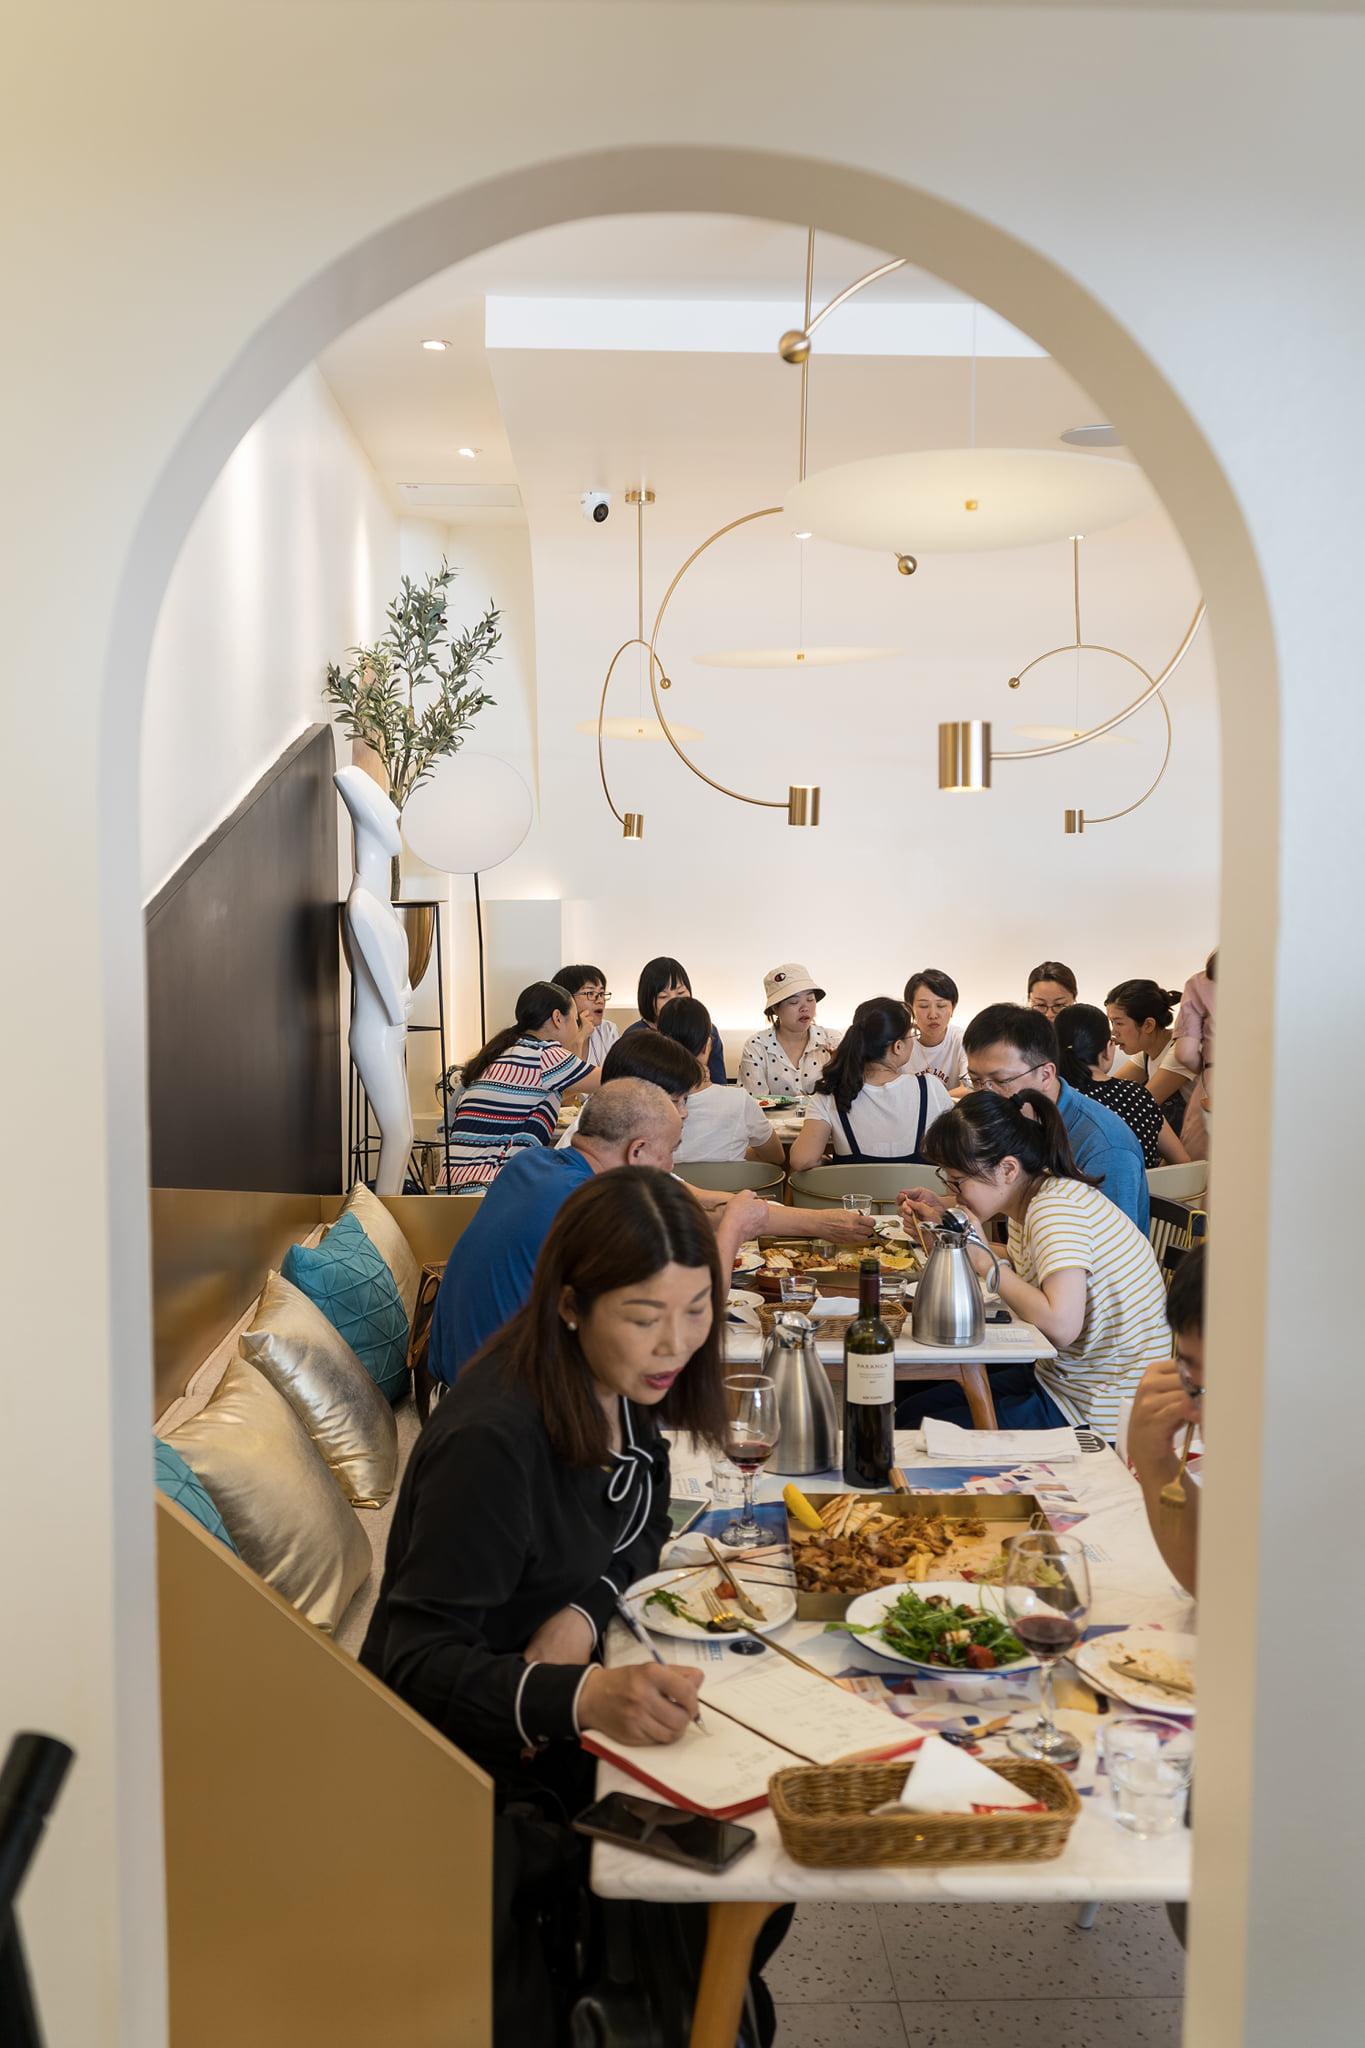 Golden Olives εστιατόριο στην Κίνα